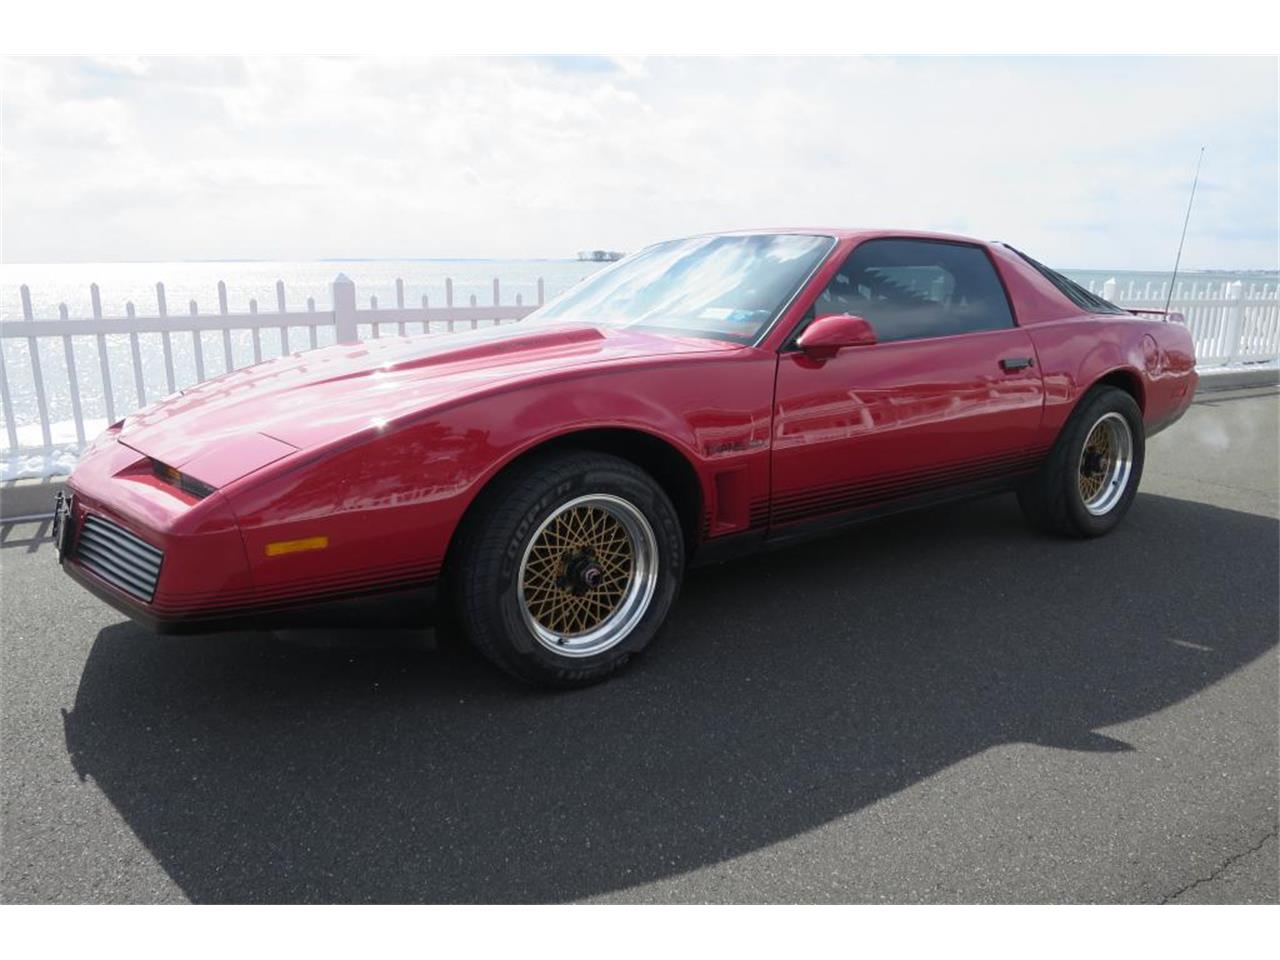 1984 pontiac firebird trans am for sale classiccars com cc 965000 1984 pontiac firebird trans am for sale